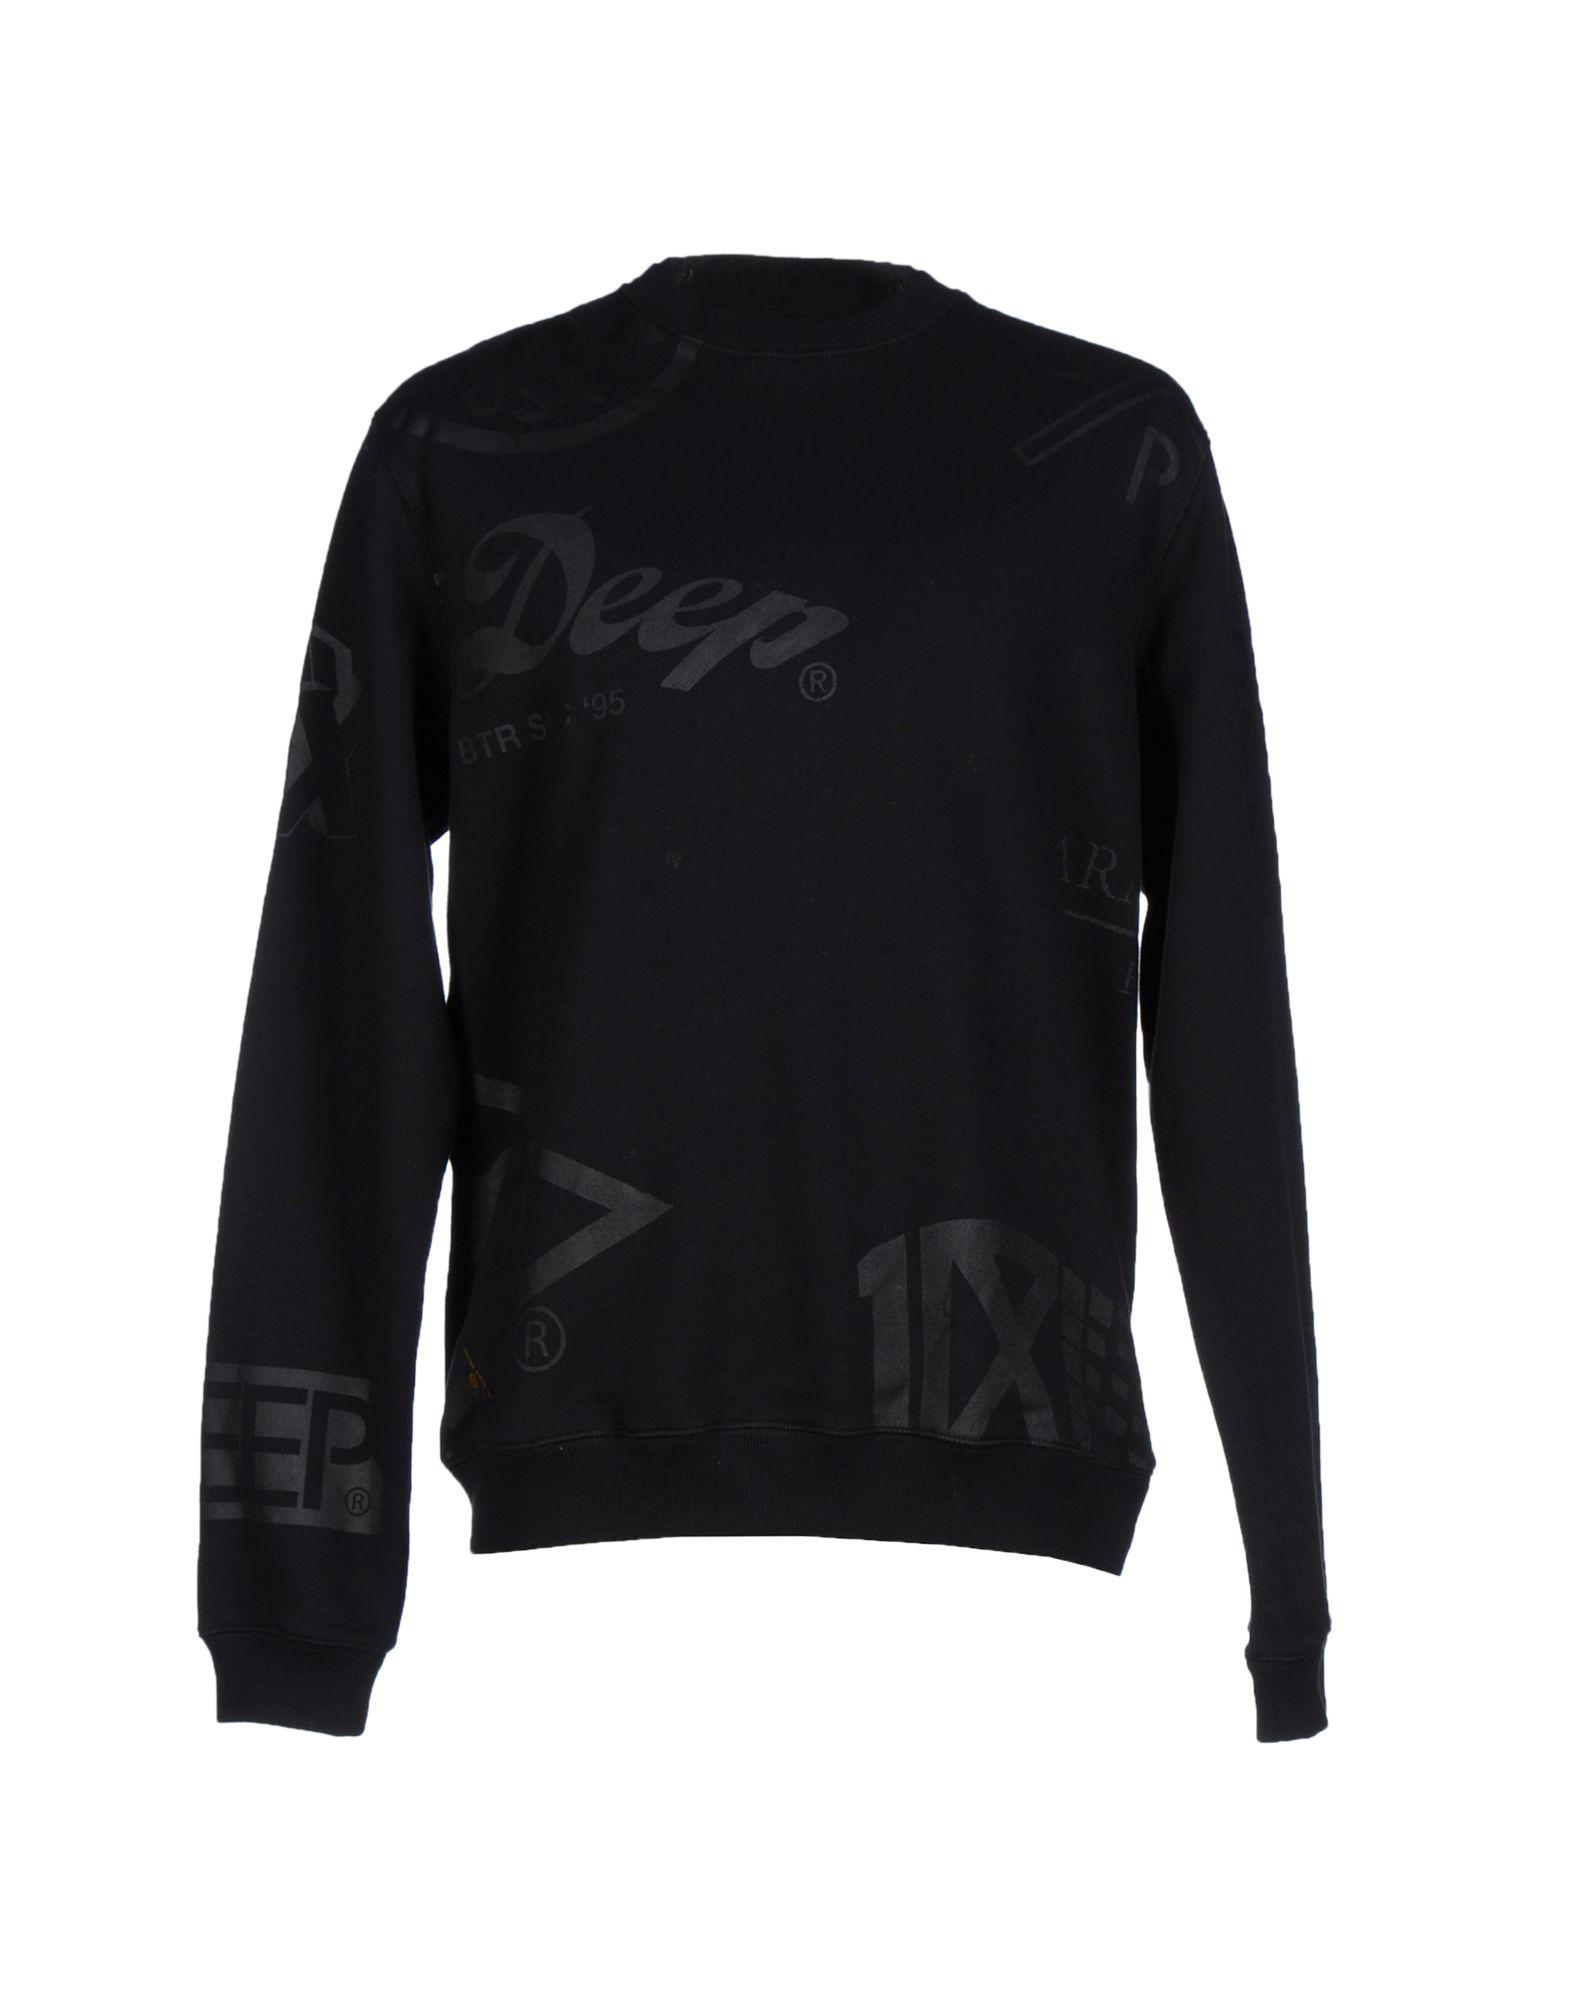 10 deep clothing